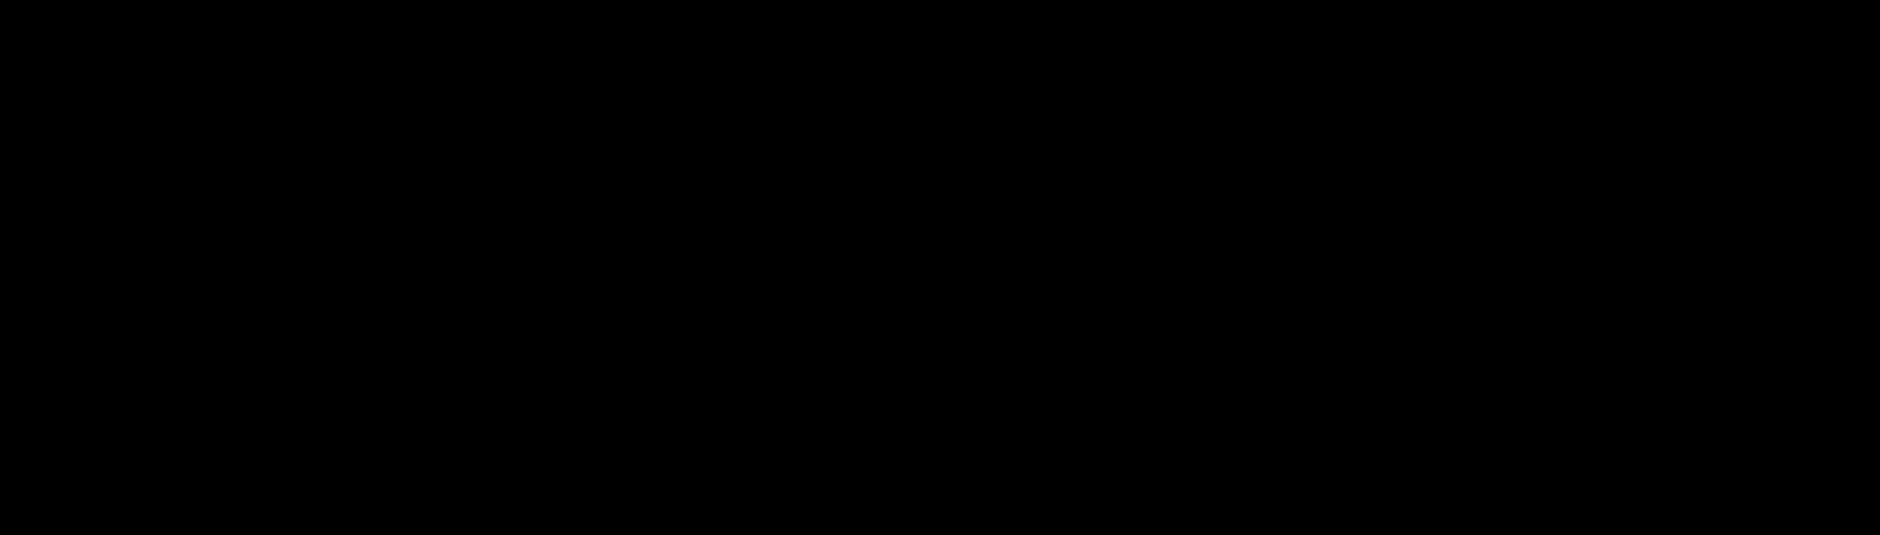 Online Store by NBPD brand of Tokyo Japan